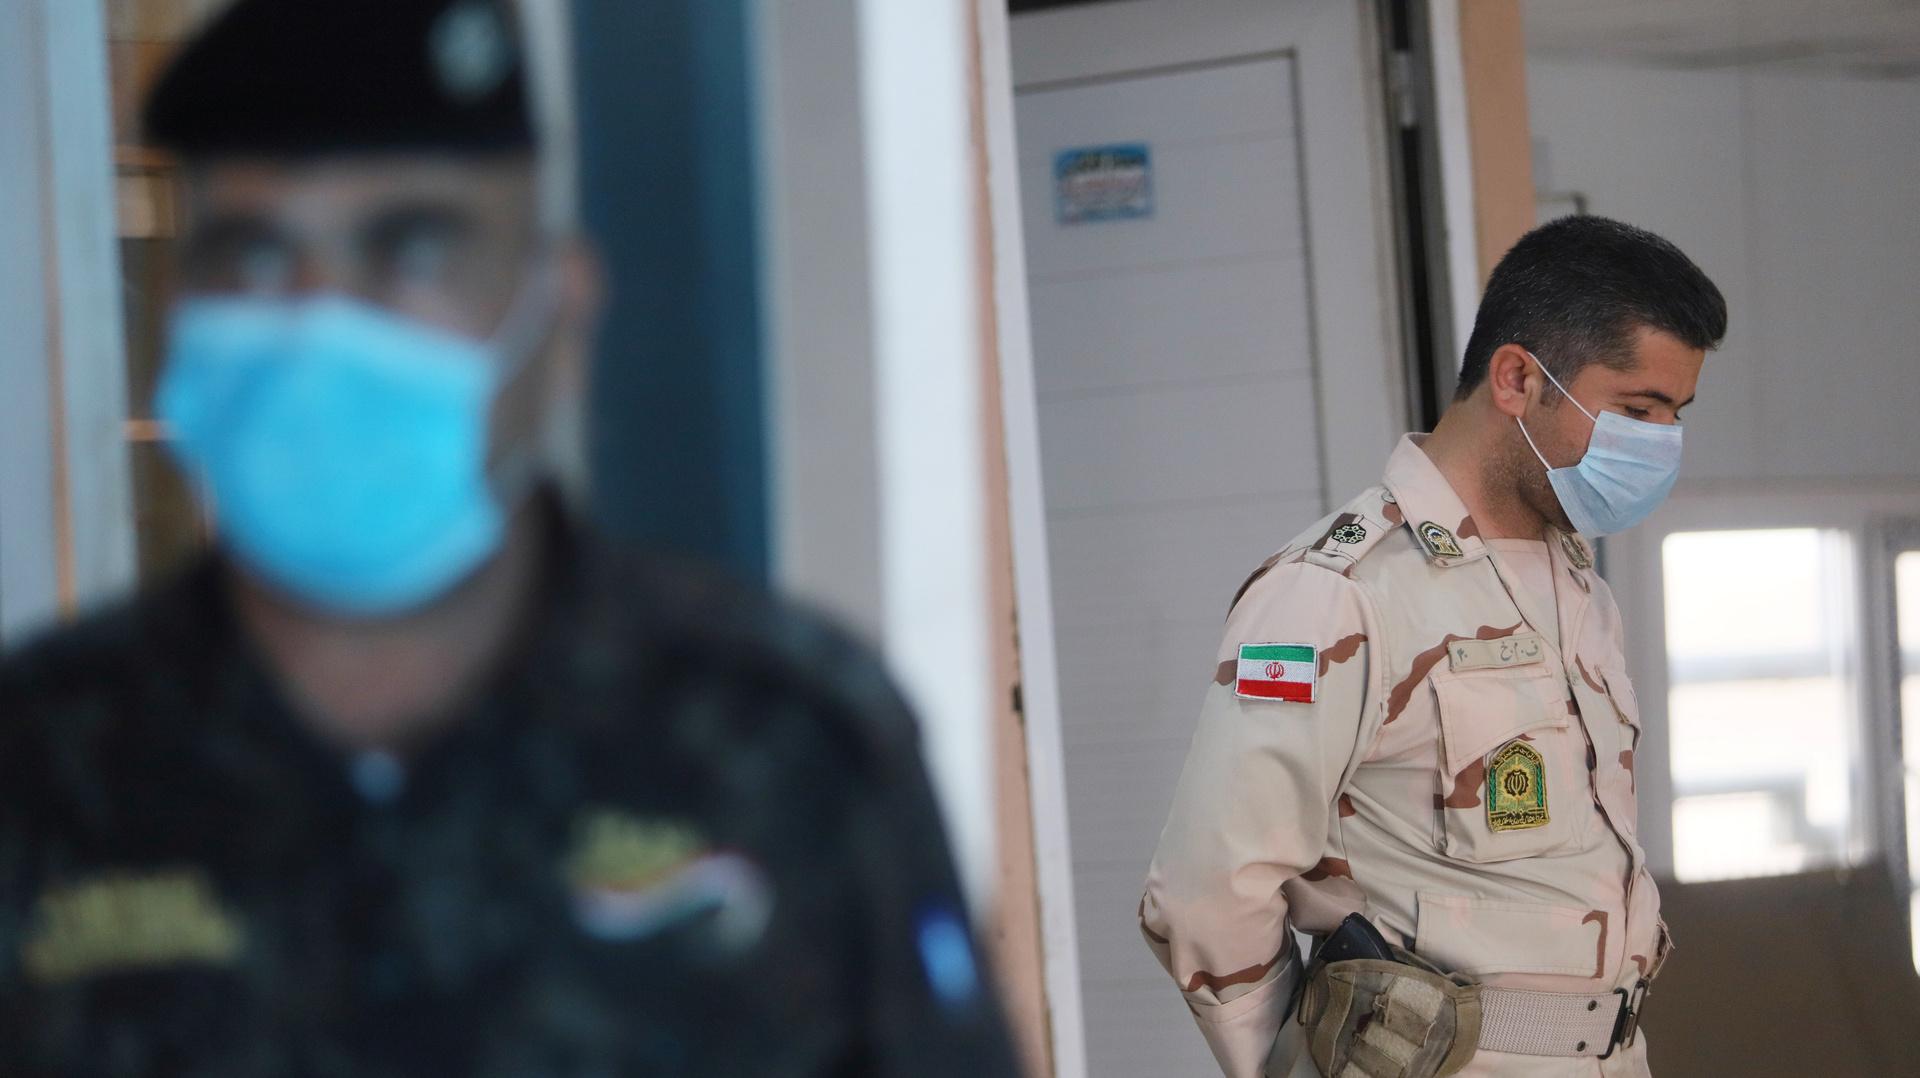 فيروس كورونا يقتل قائدا عسكريا كبيرا في إيران